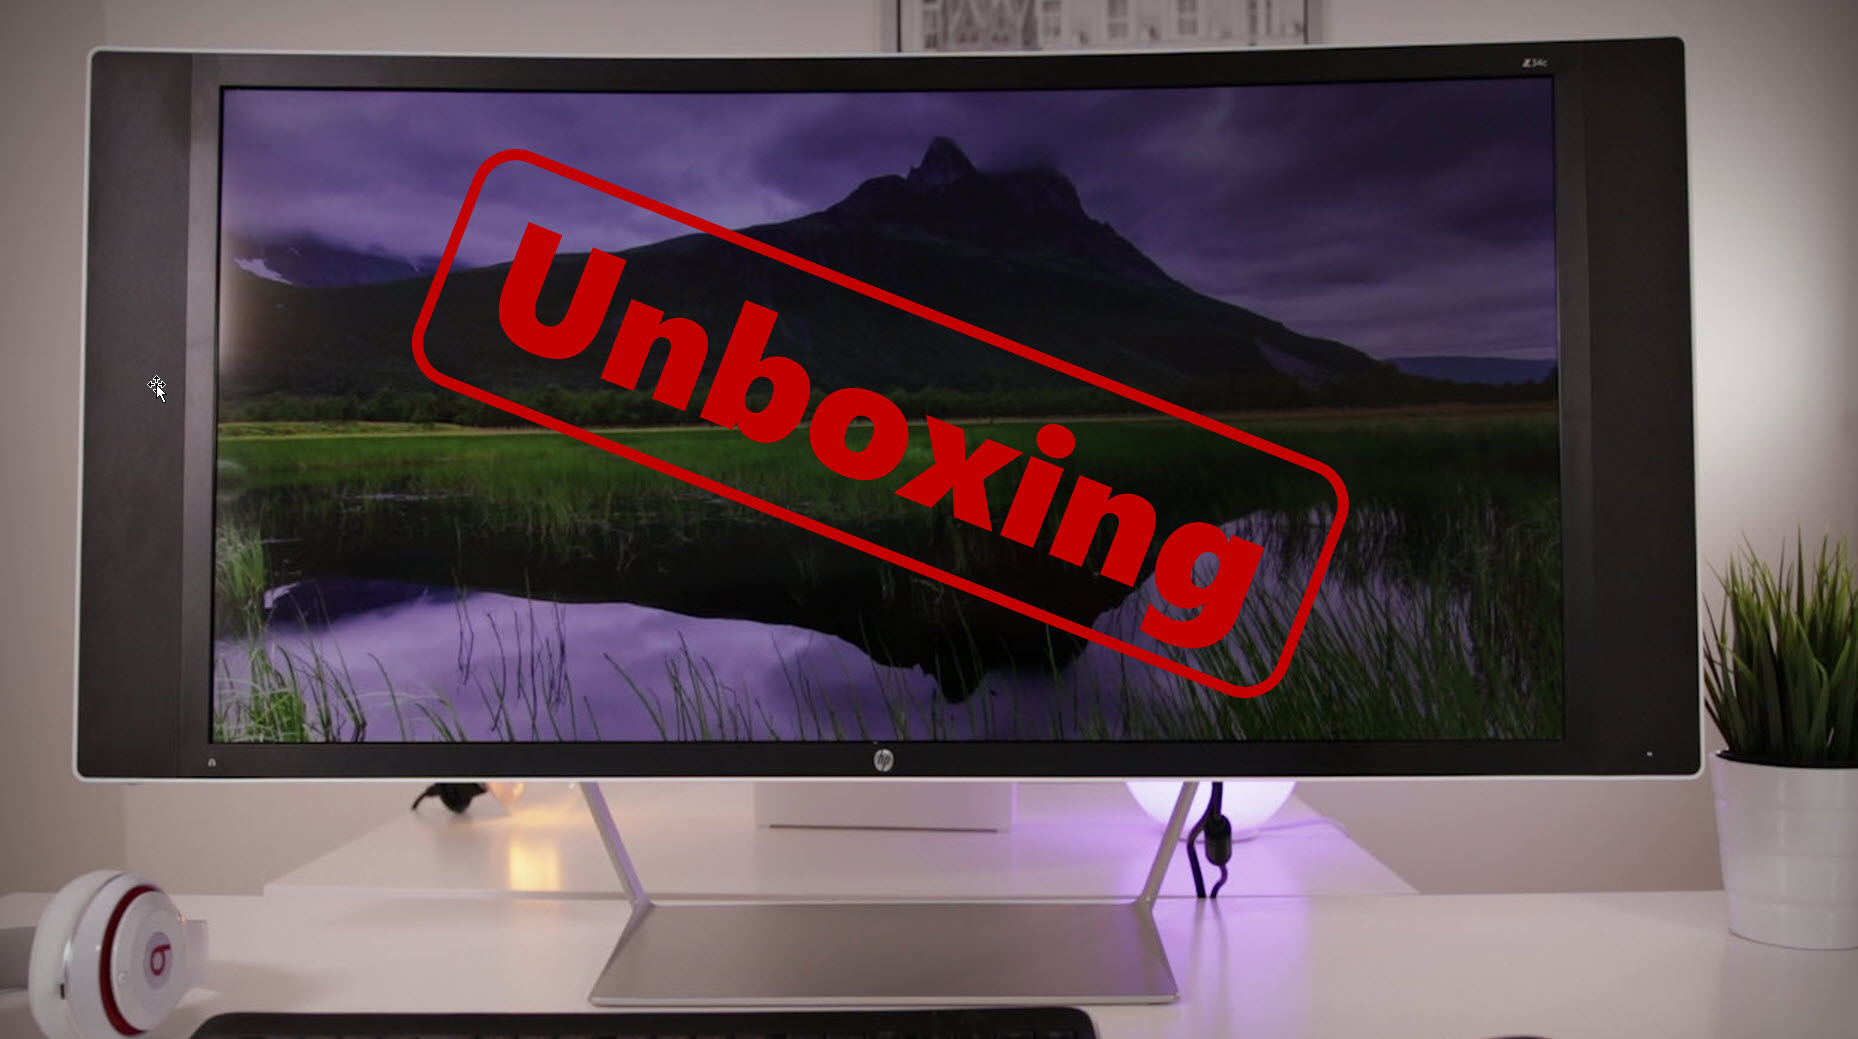 Unboxing-ZHP34c-Ultrabred-buet-skjerm-2